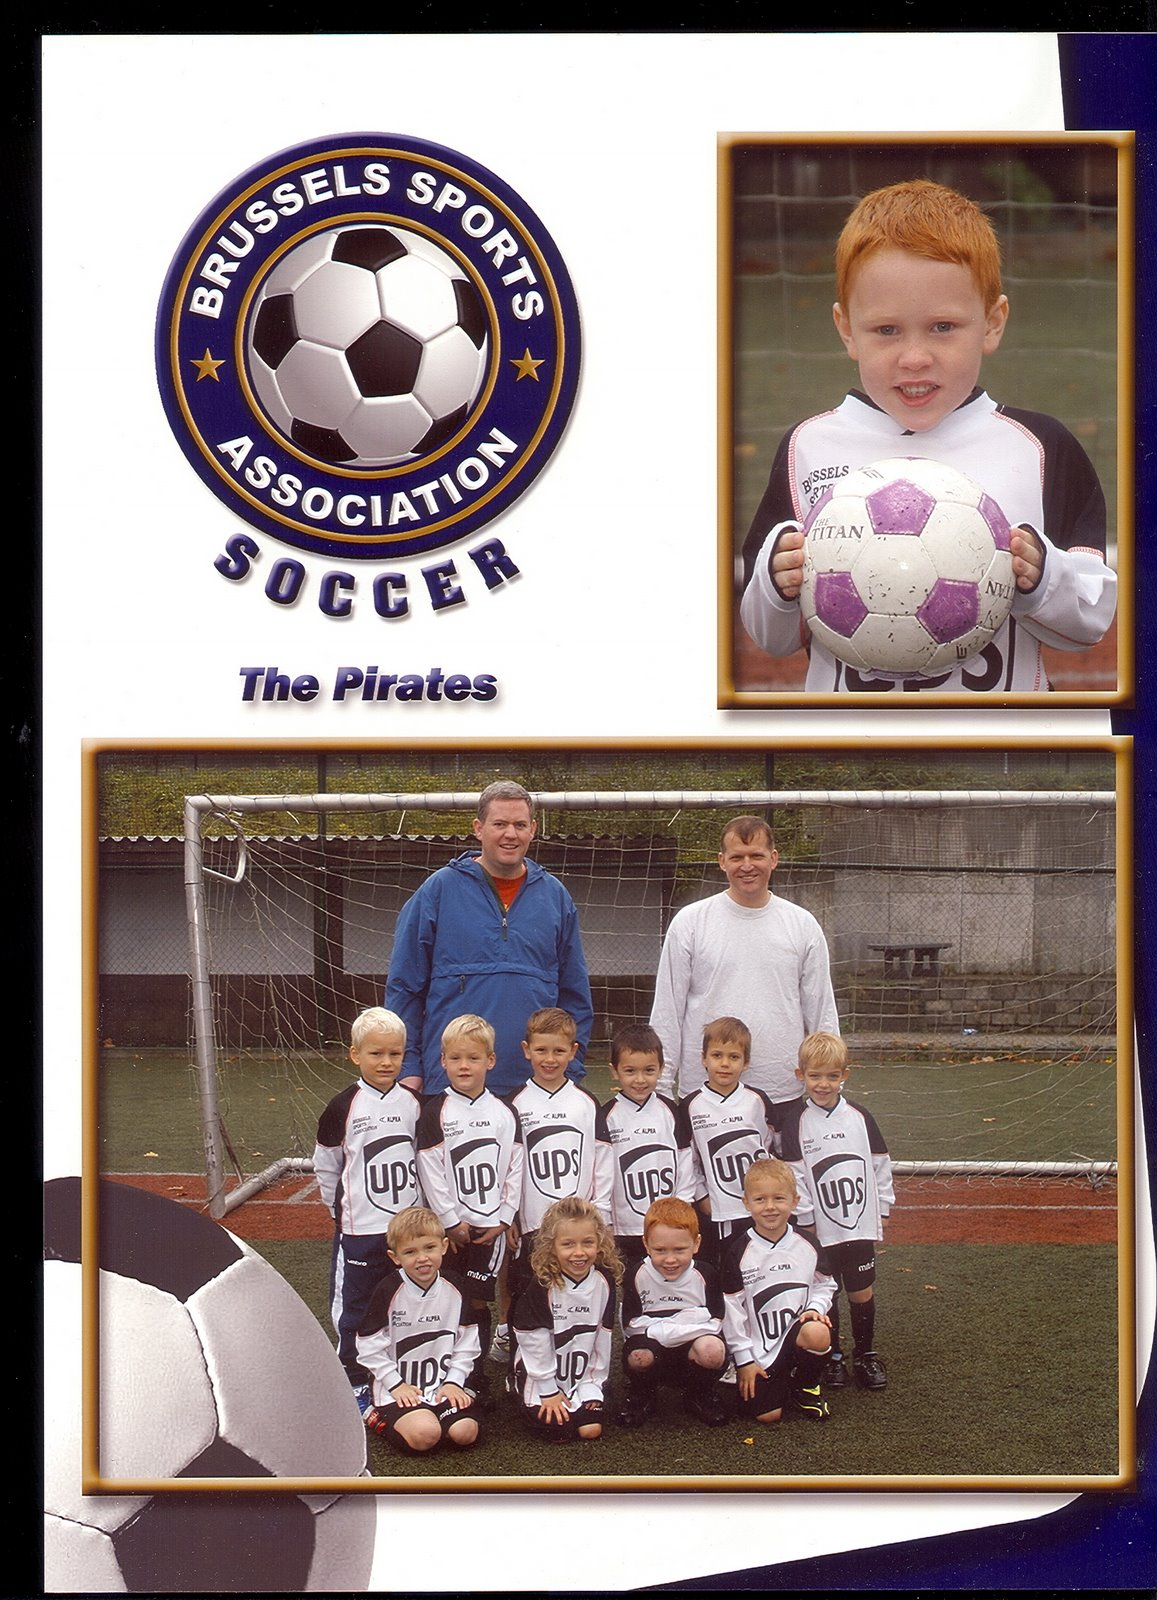 [Elston's+Belgium+Soccer+Association.jpg]